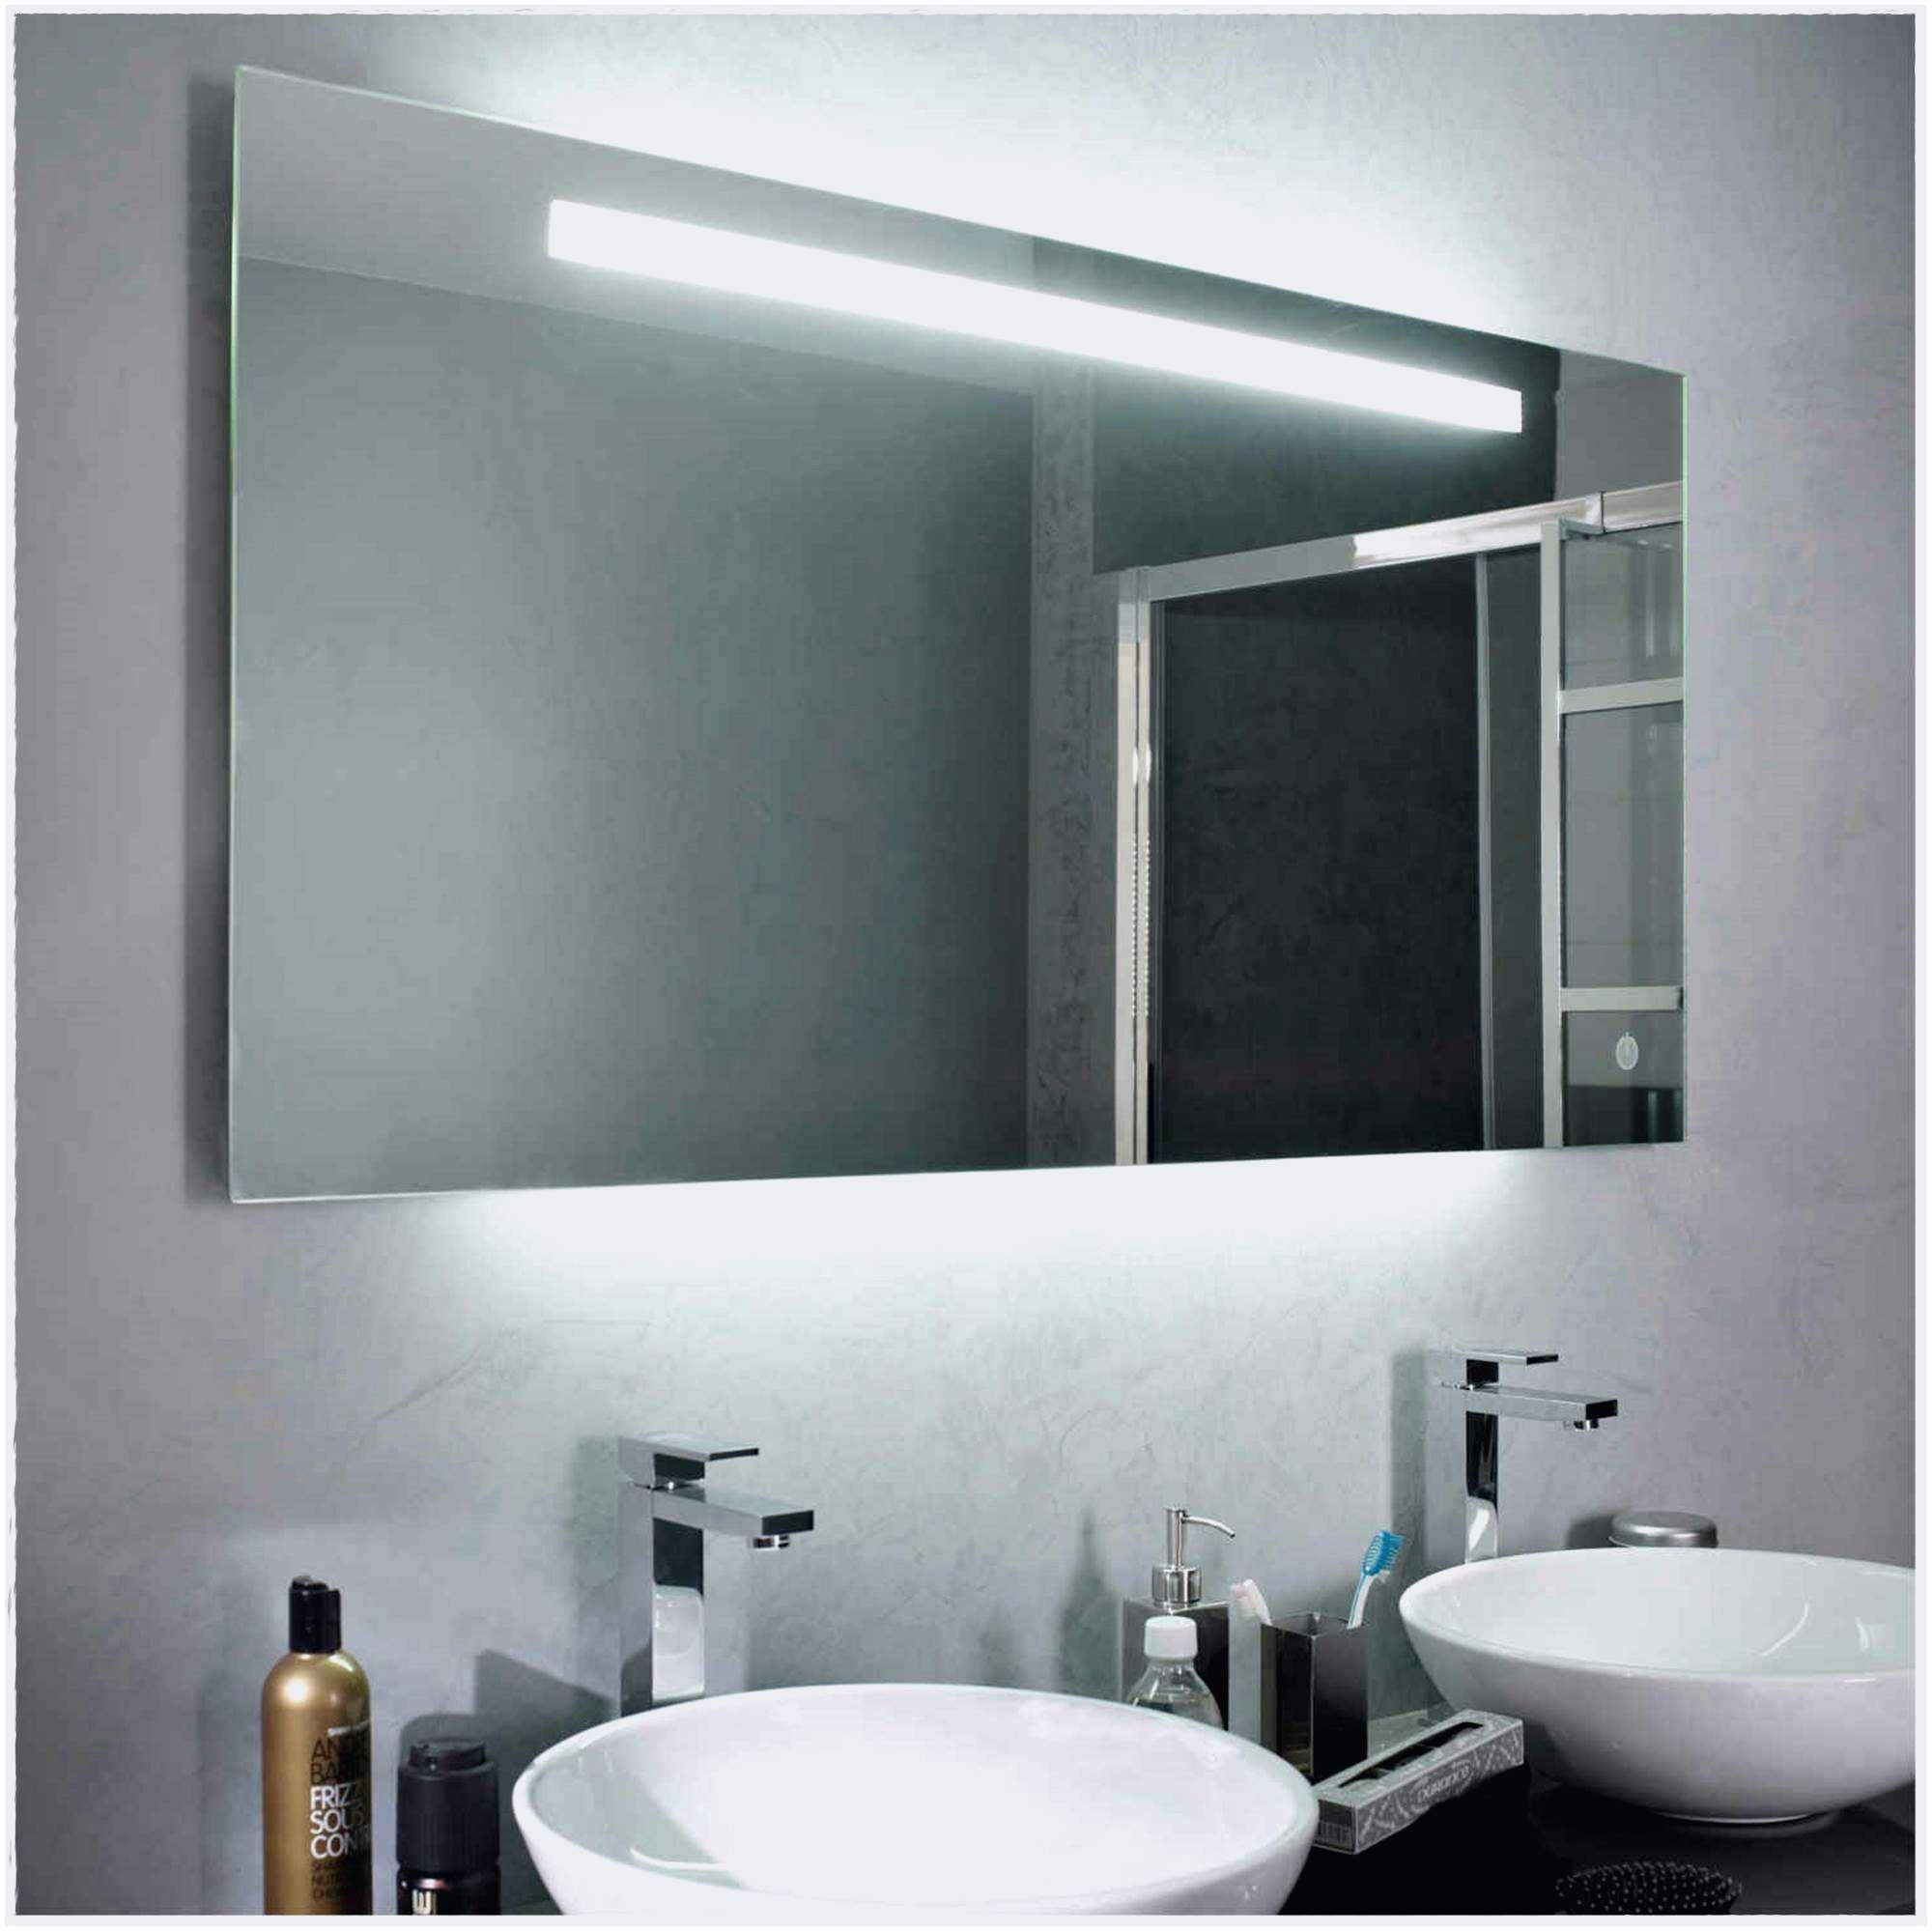 Baignoire Ilot Brico Depot Baignoire Ilot Brico Depot Cuisine Brico Depot Decouvrez Une Large Modern Bathroom Vanity Bathroom Mirror Lighted Bathroom Mirror